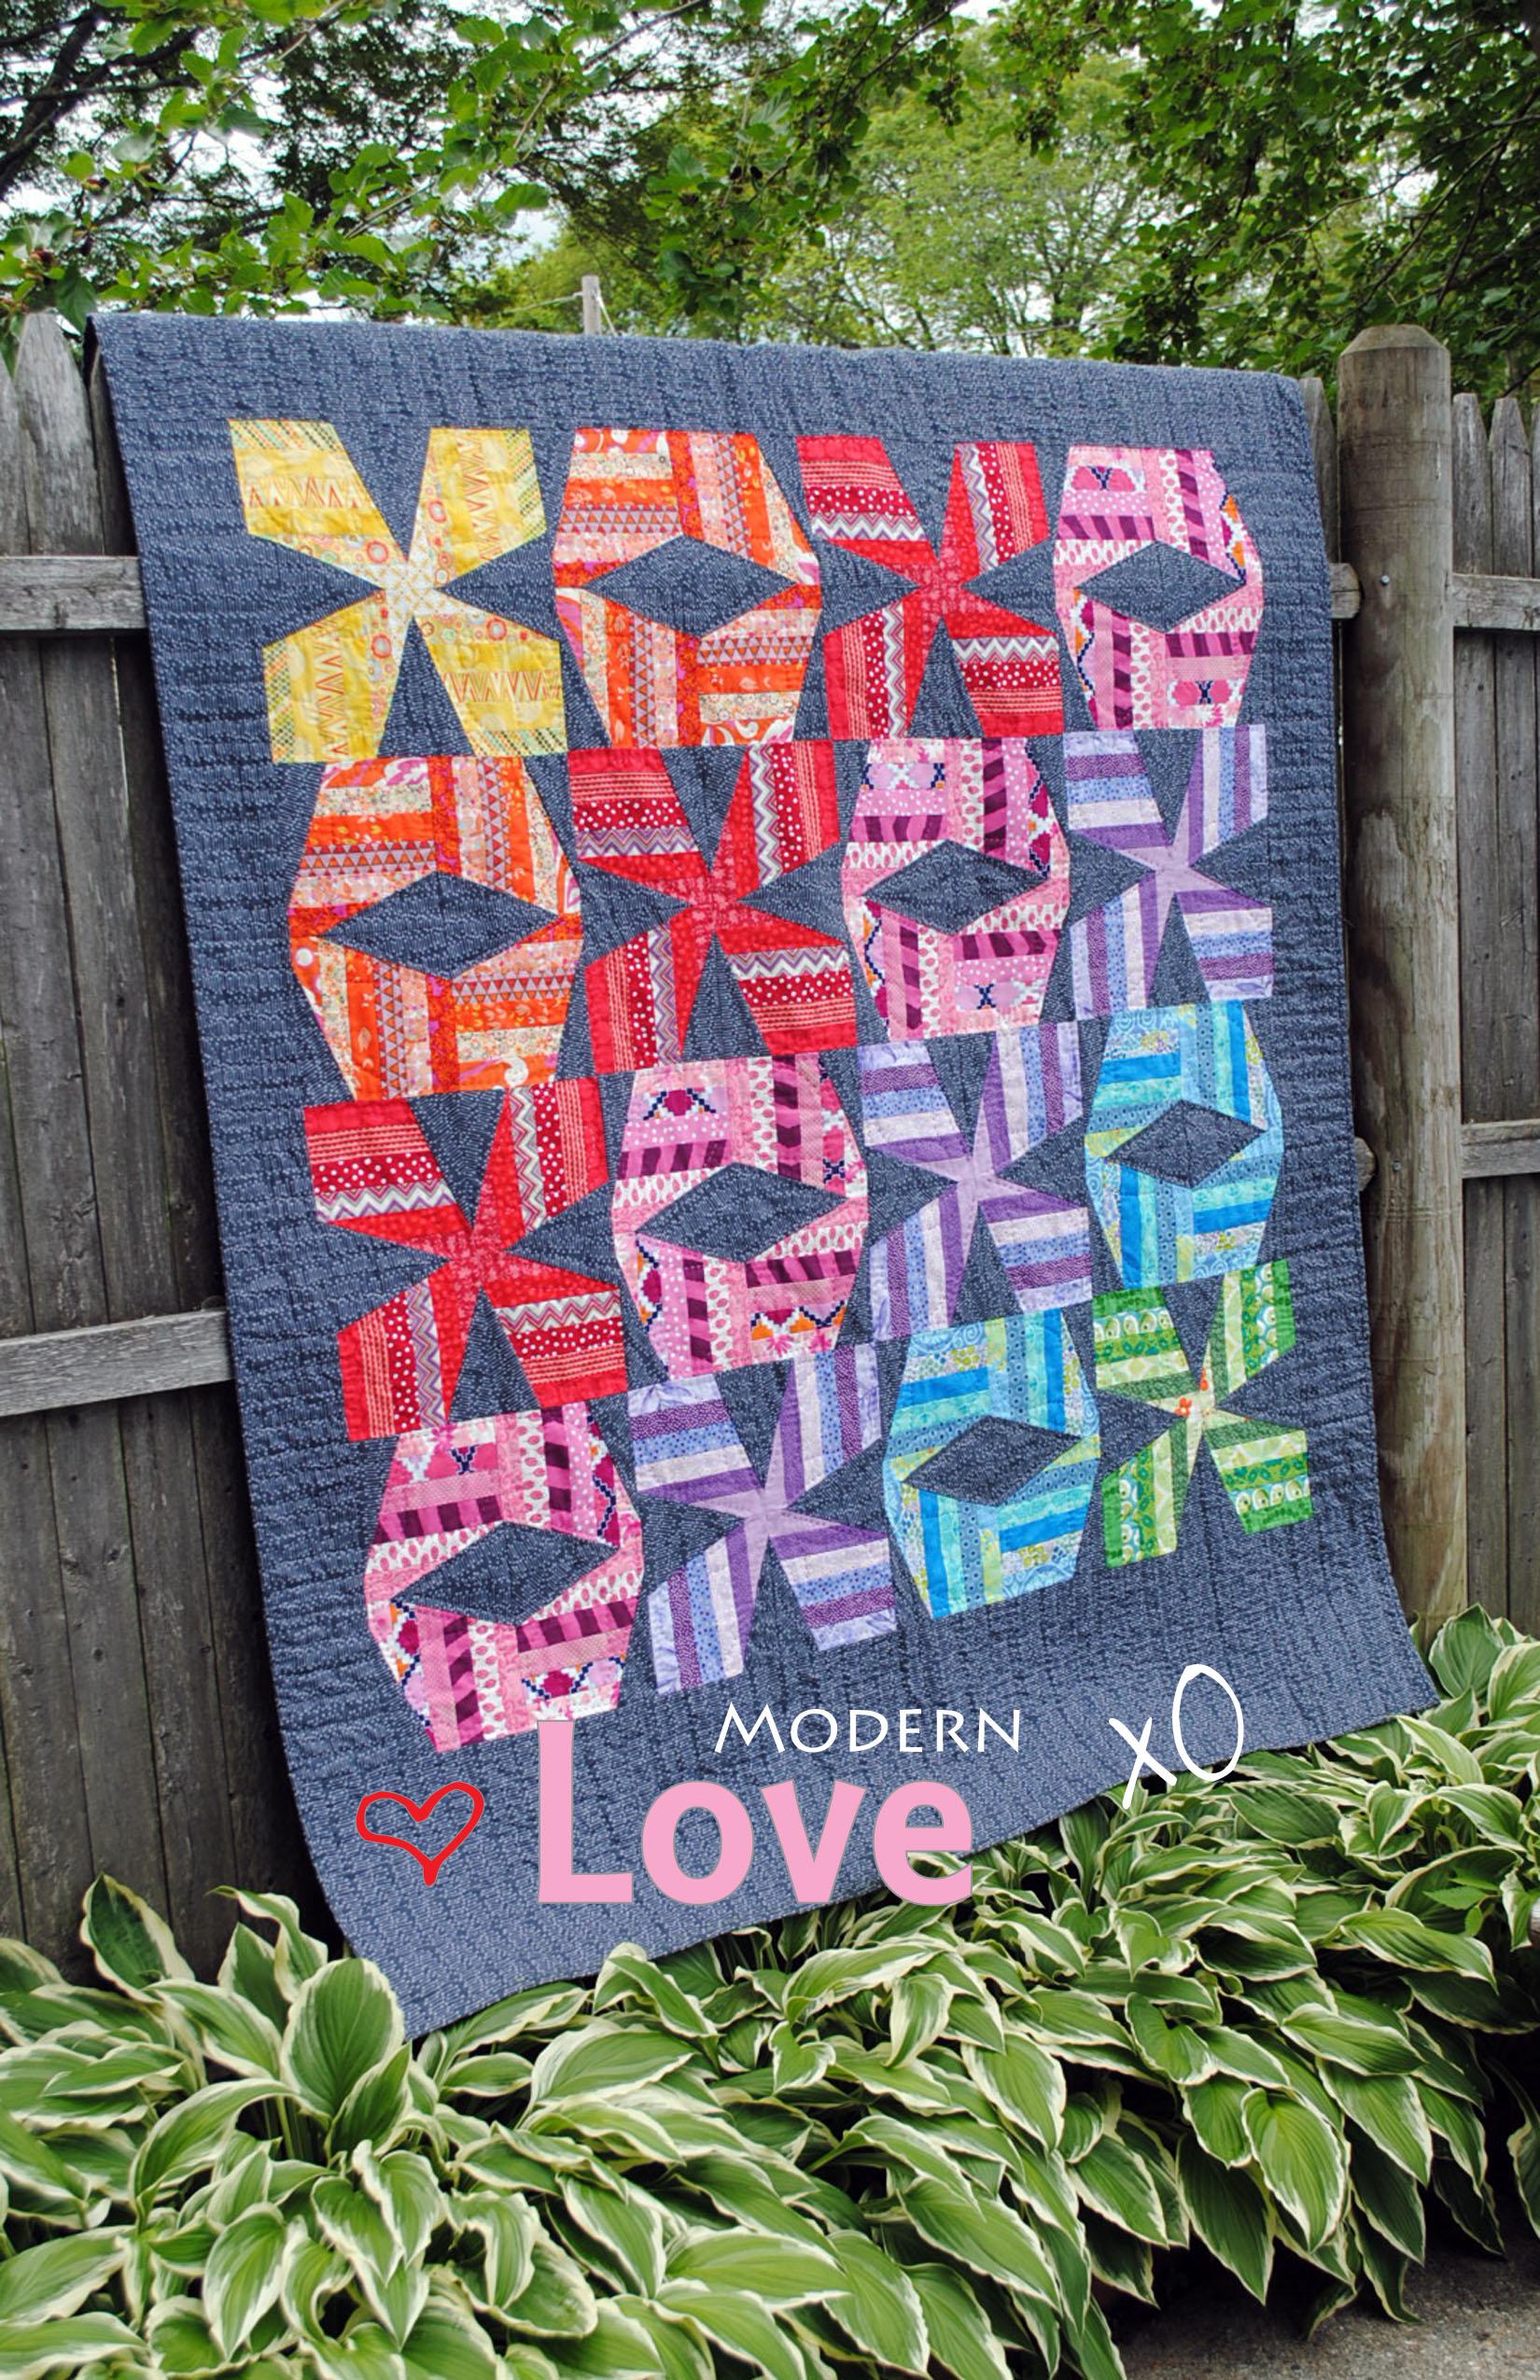 Modern love xo quilt pattern for Modern house quilt pattern